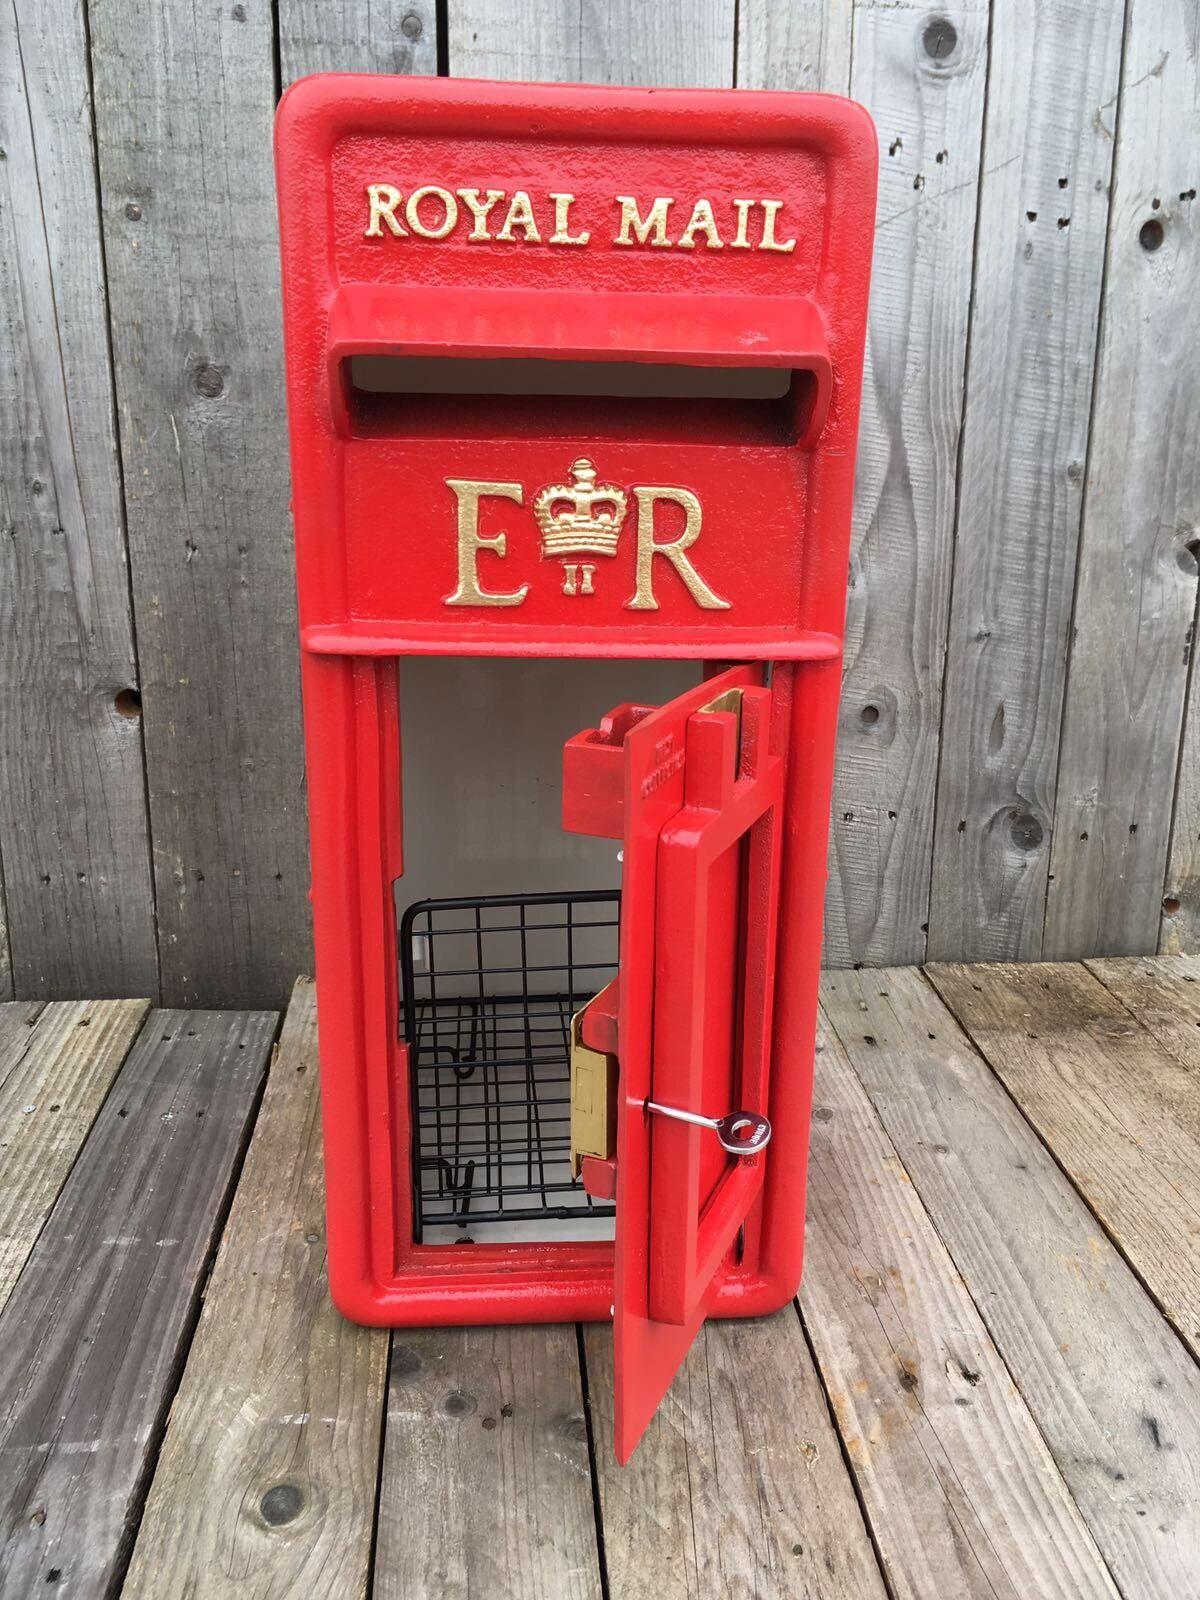 Royal Mail Briefkasten Er Britisch Machan Schottland & Gitter Chubb Schloss